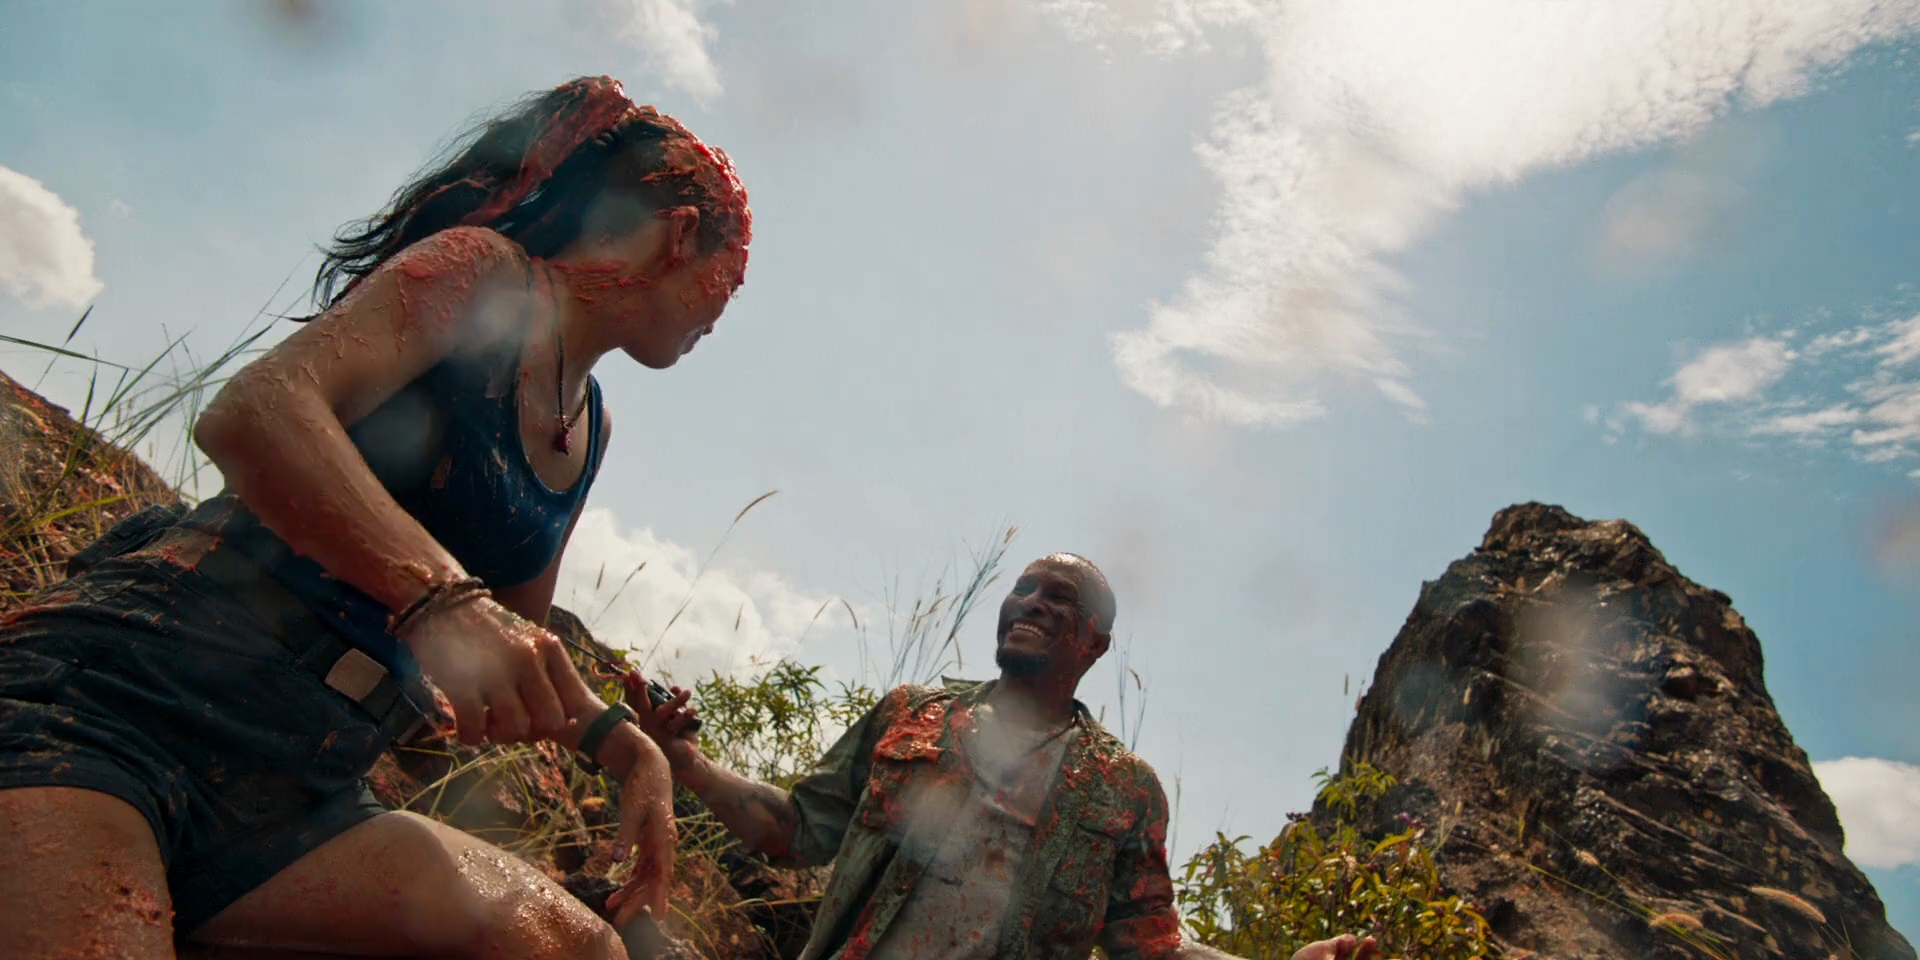 Yeraltı Canavarı 7: Çığırtkanlar Adası | 2020 | BDRip | XviD | Türkçe Dublaj | m720p - m1080p | BluRay | Dual | TR-EN | Tek Link